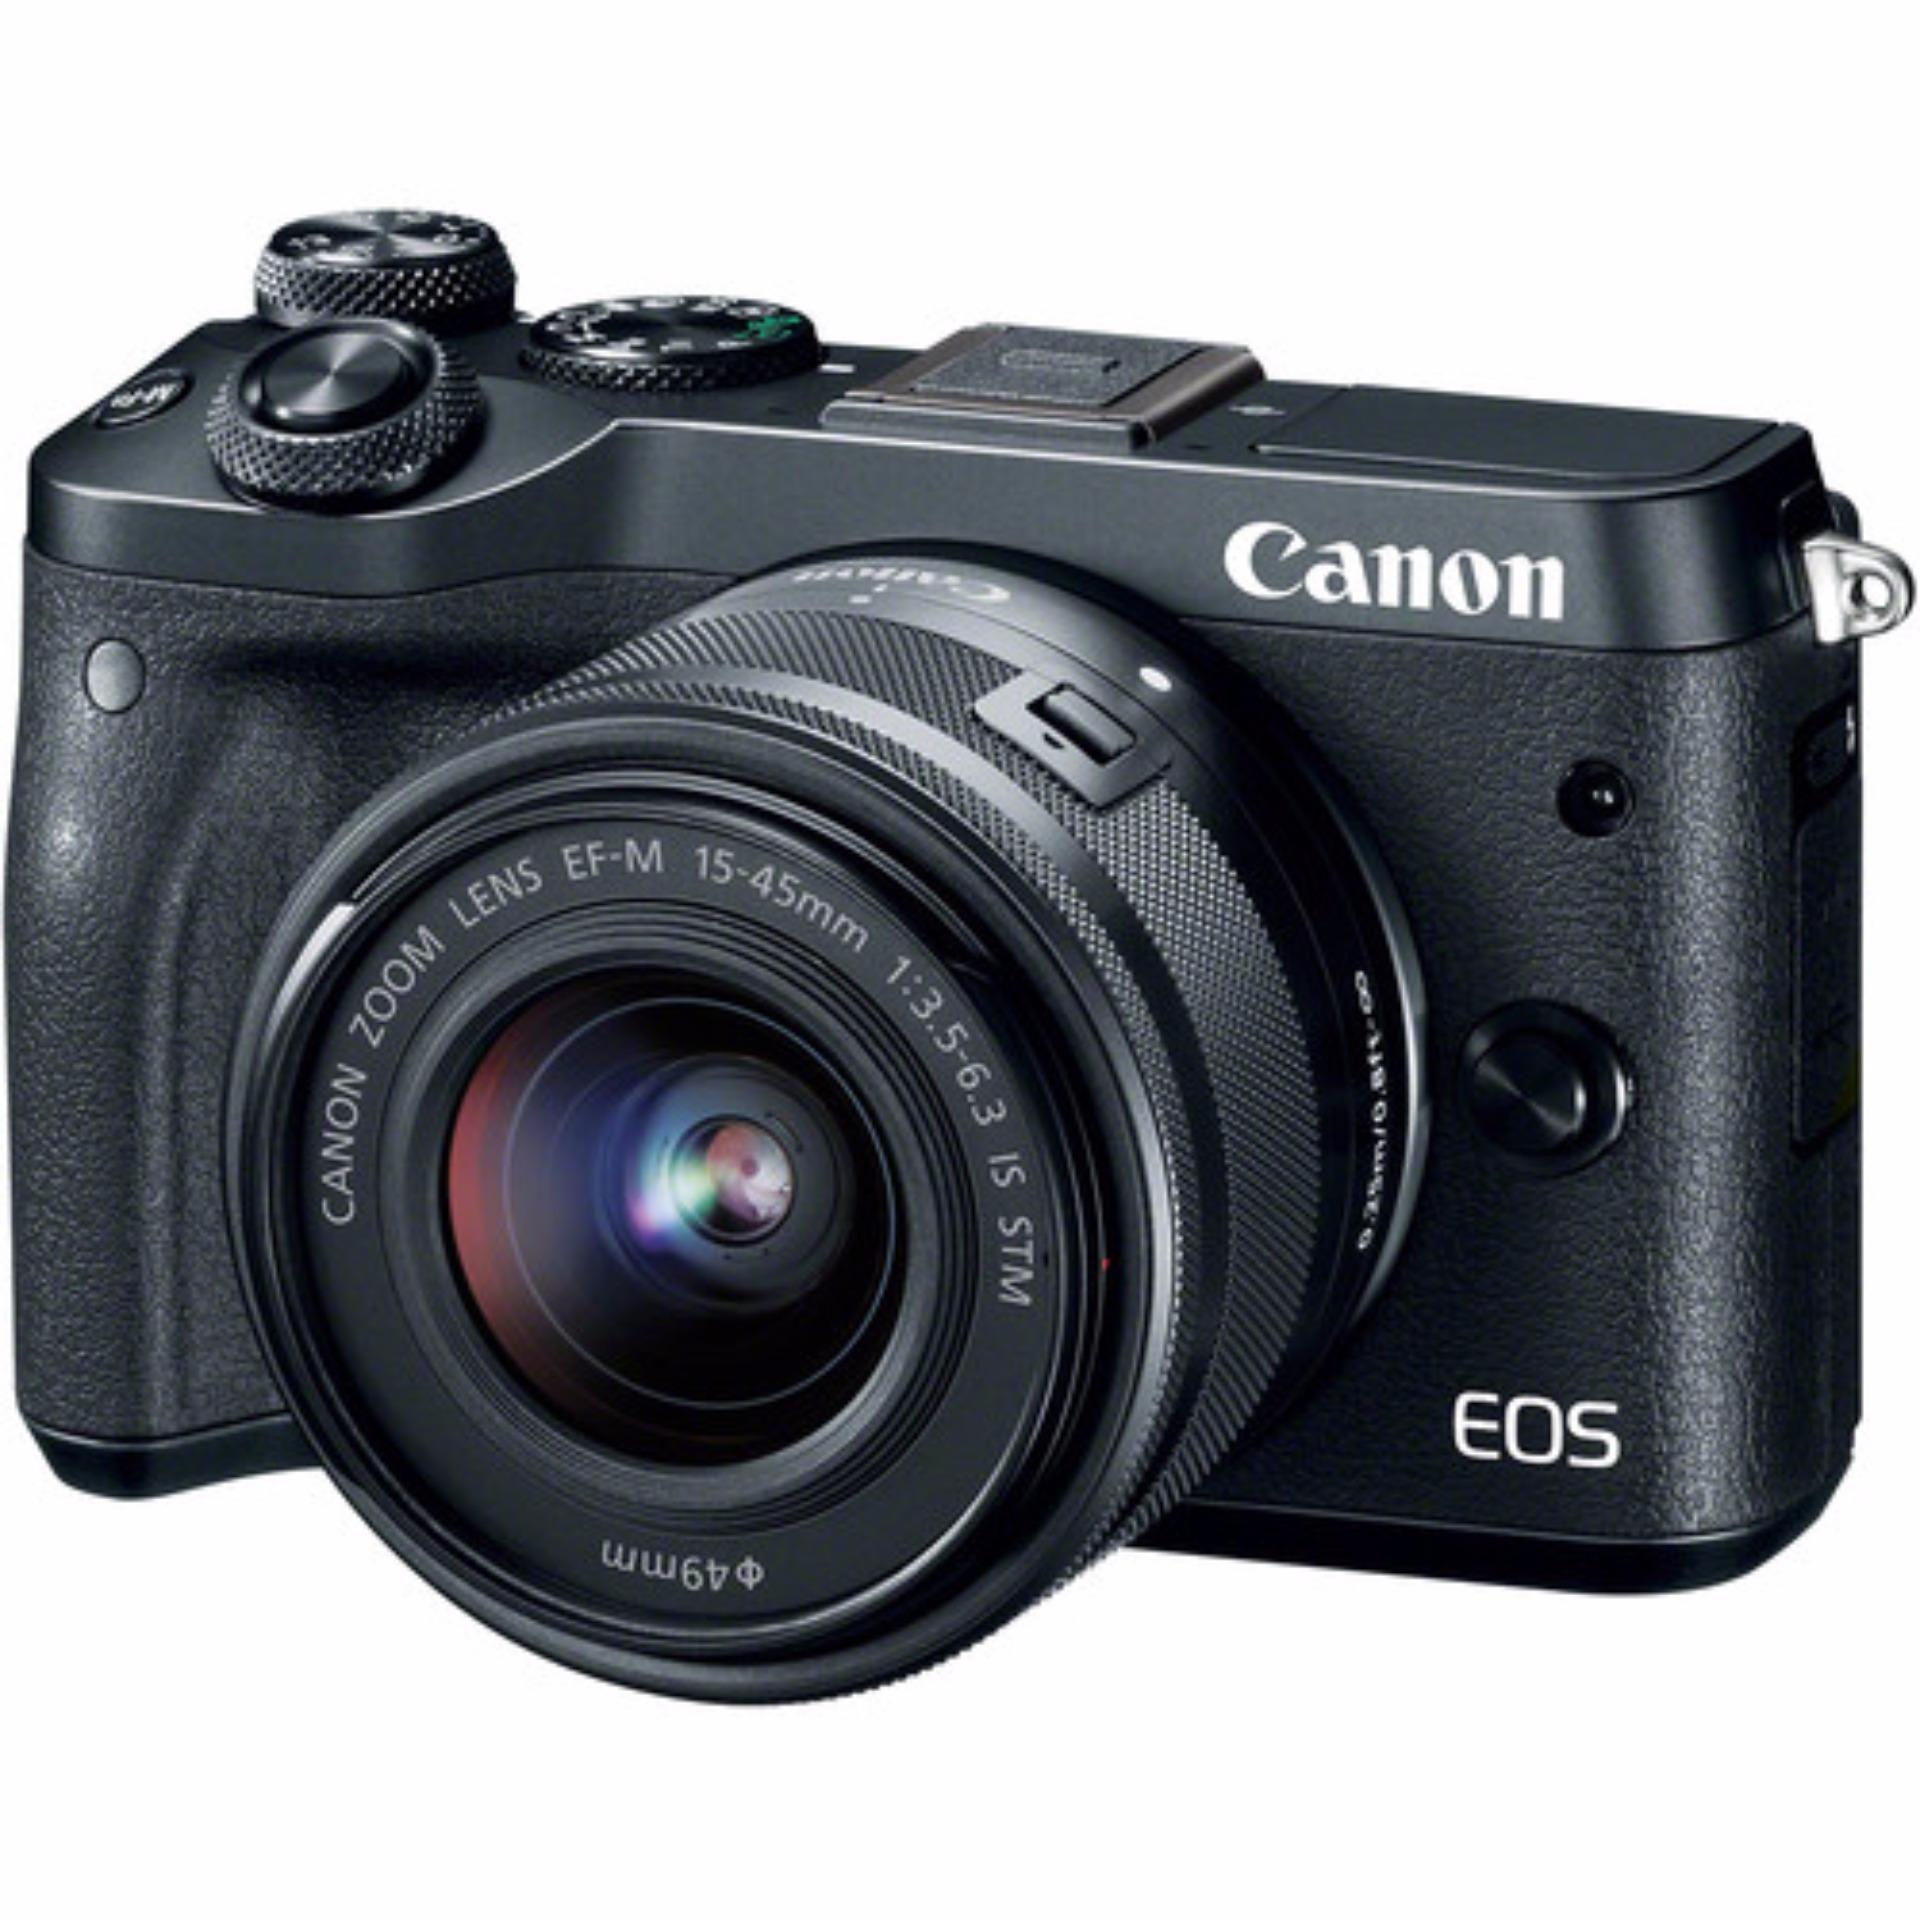 Canon EOS M6 15-45mm Kit (Black) (FREE 16GB SD Card)